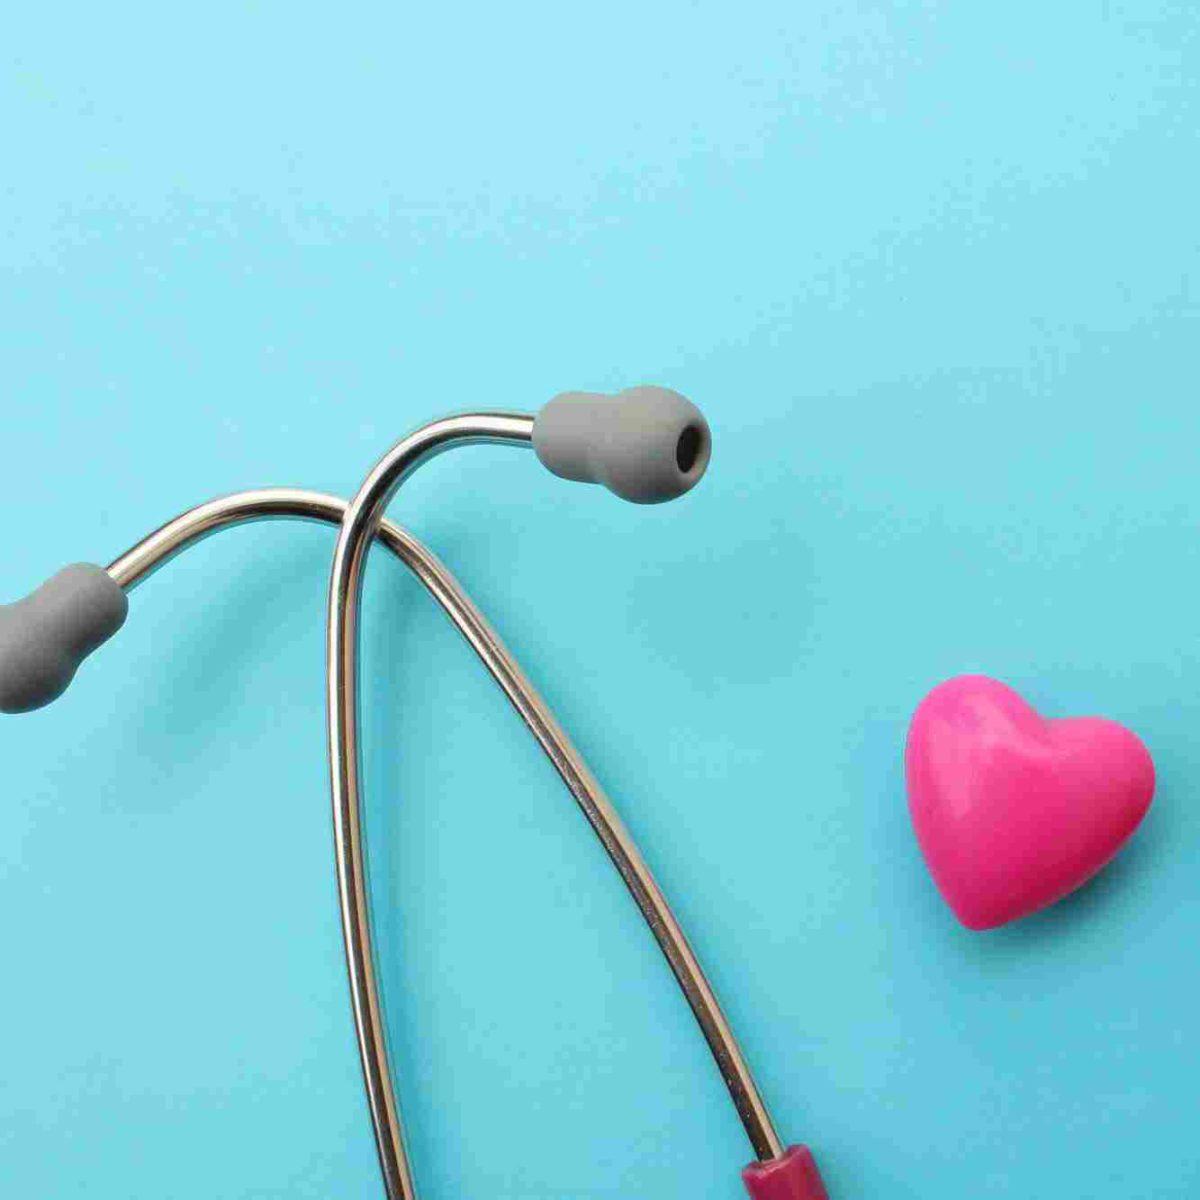 http://www.liveloveat.it/wp-content/uploads/2015/12/srce-i-stetoskop-1200x1200.jpg